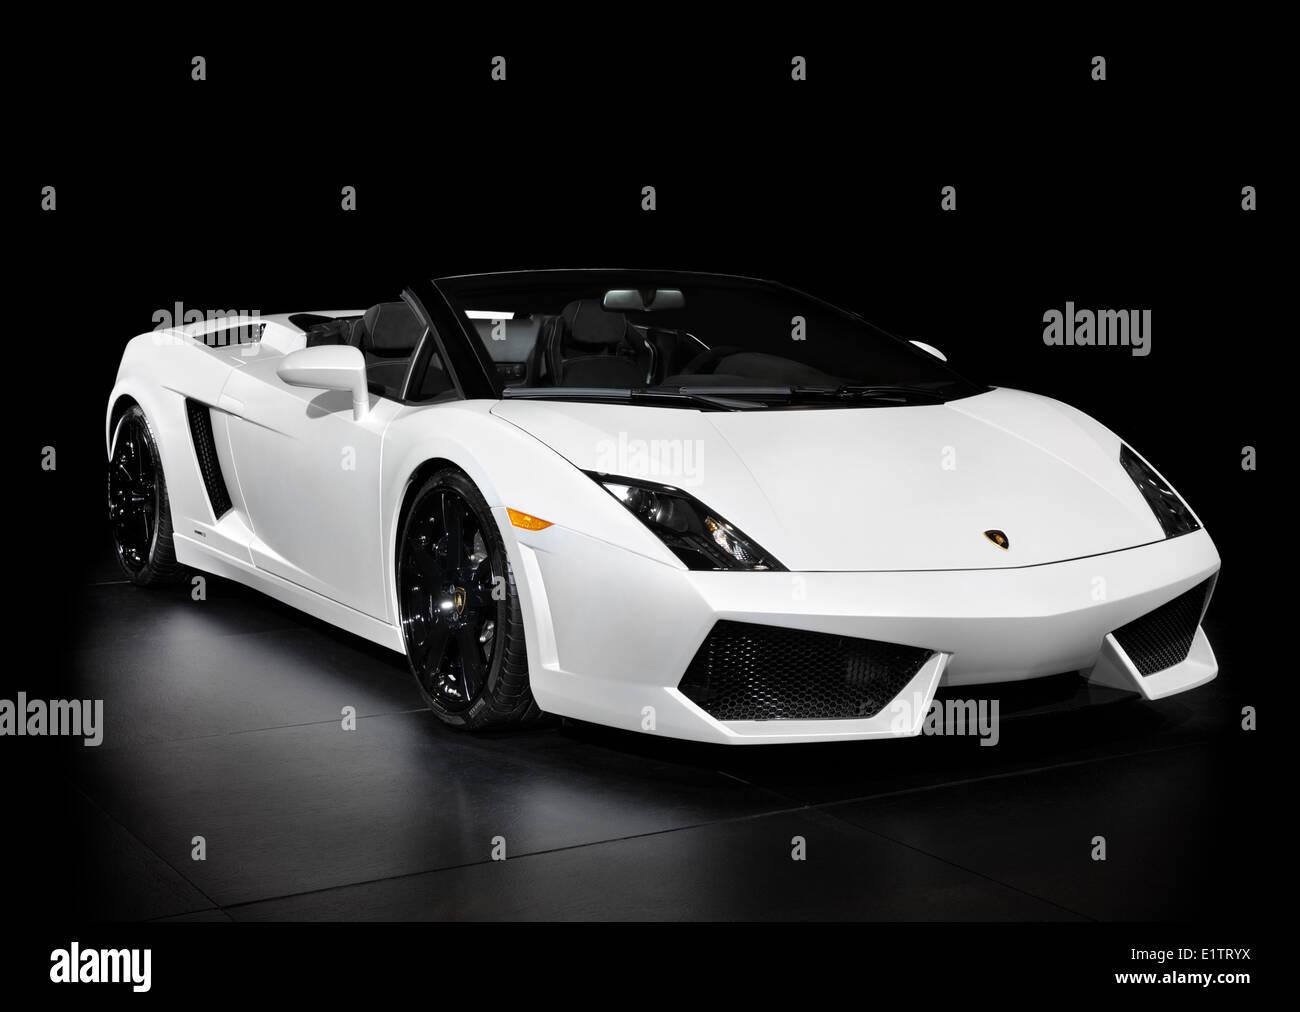 White Lamborghini Gallardo LP5604 Spyder super car isolated on